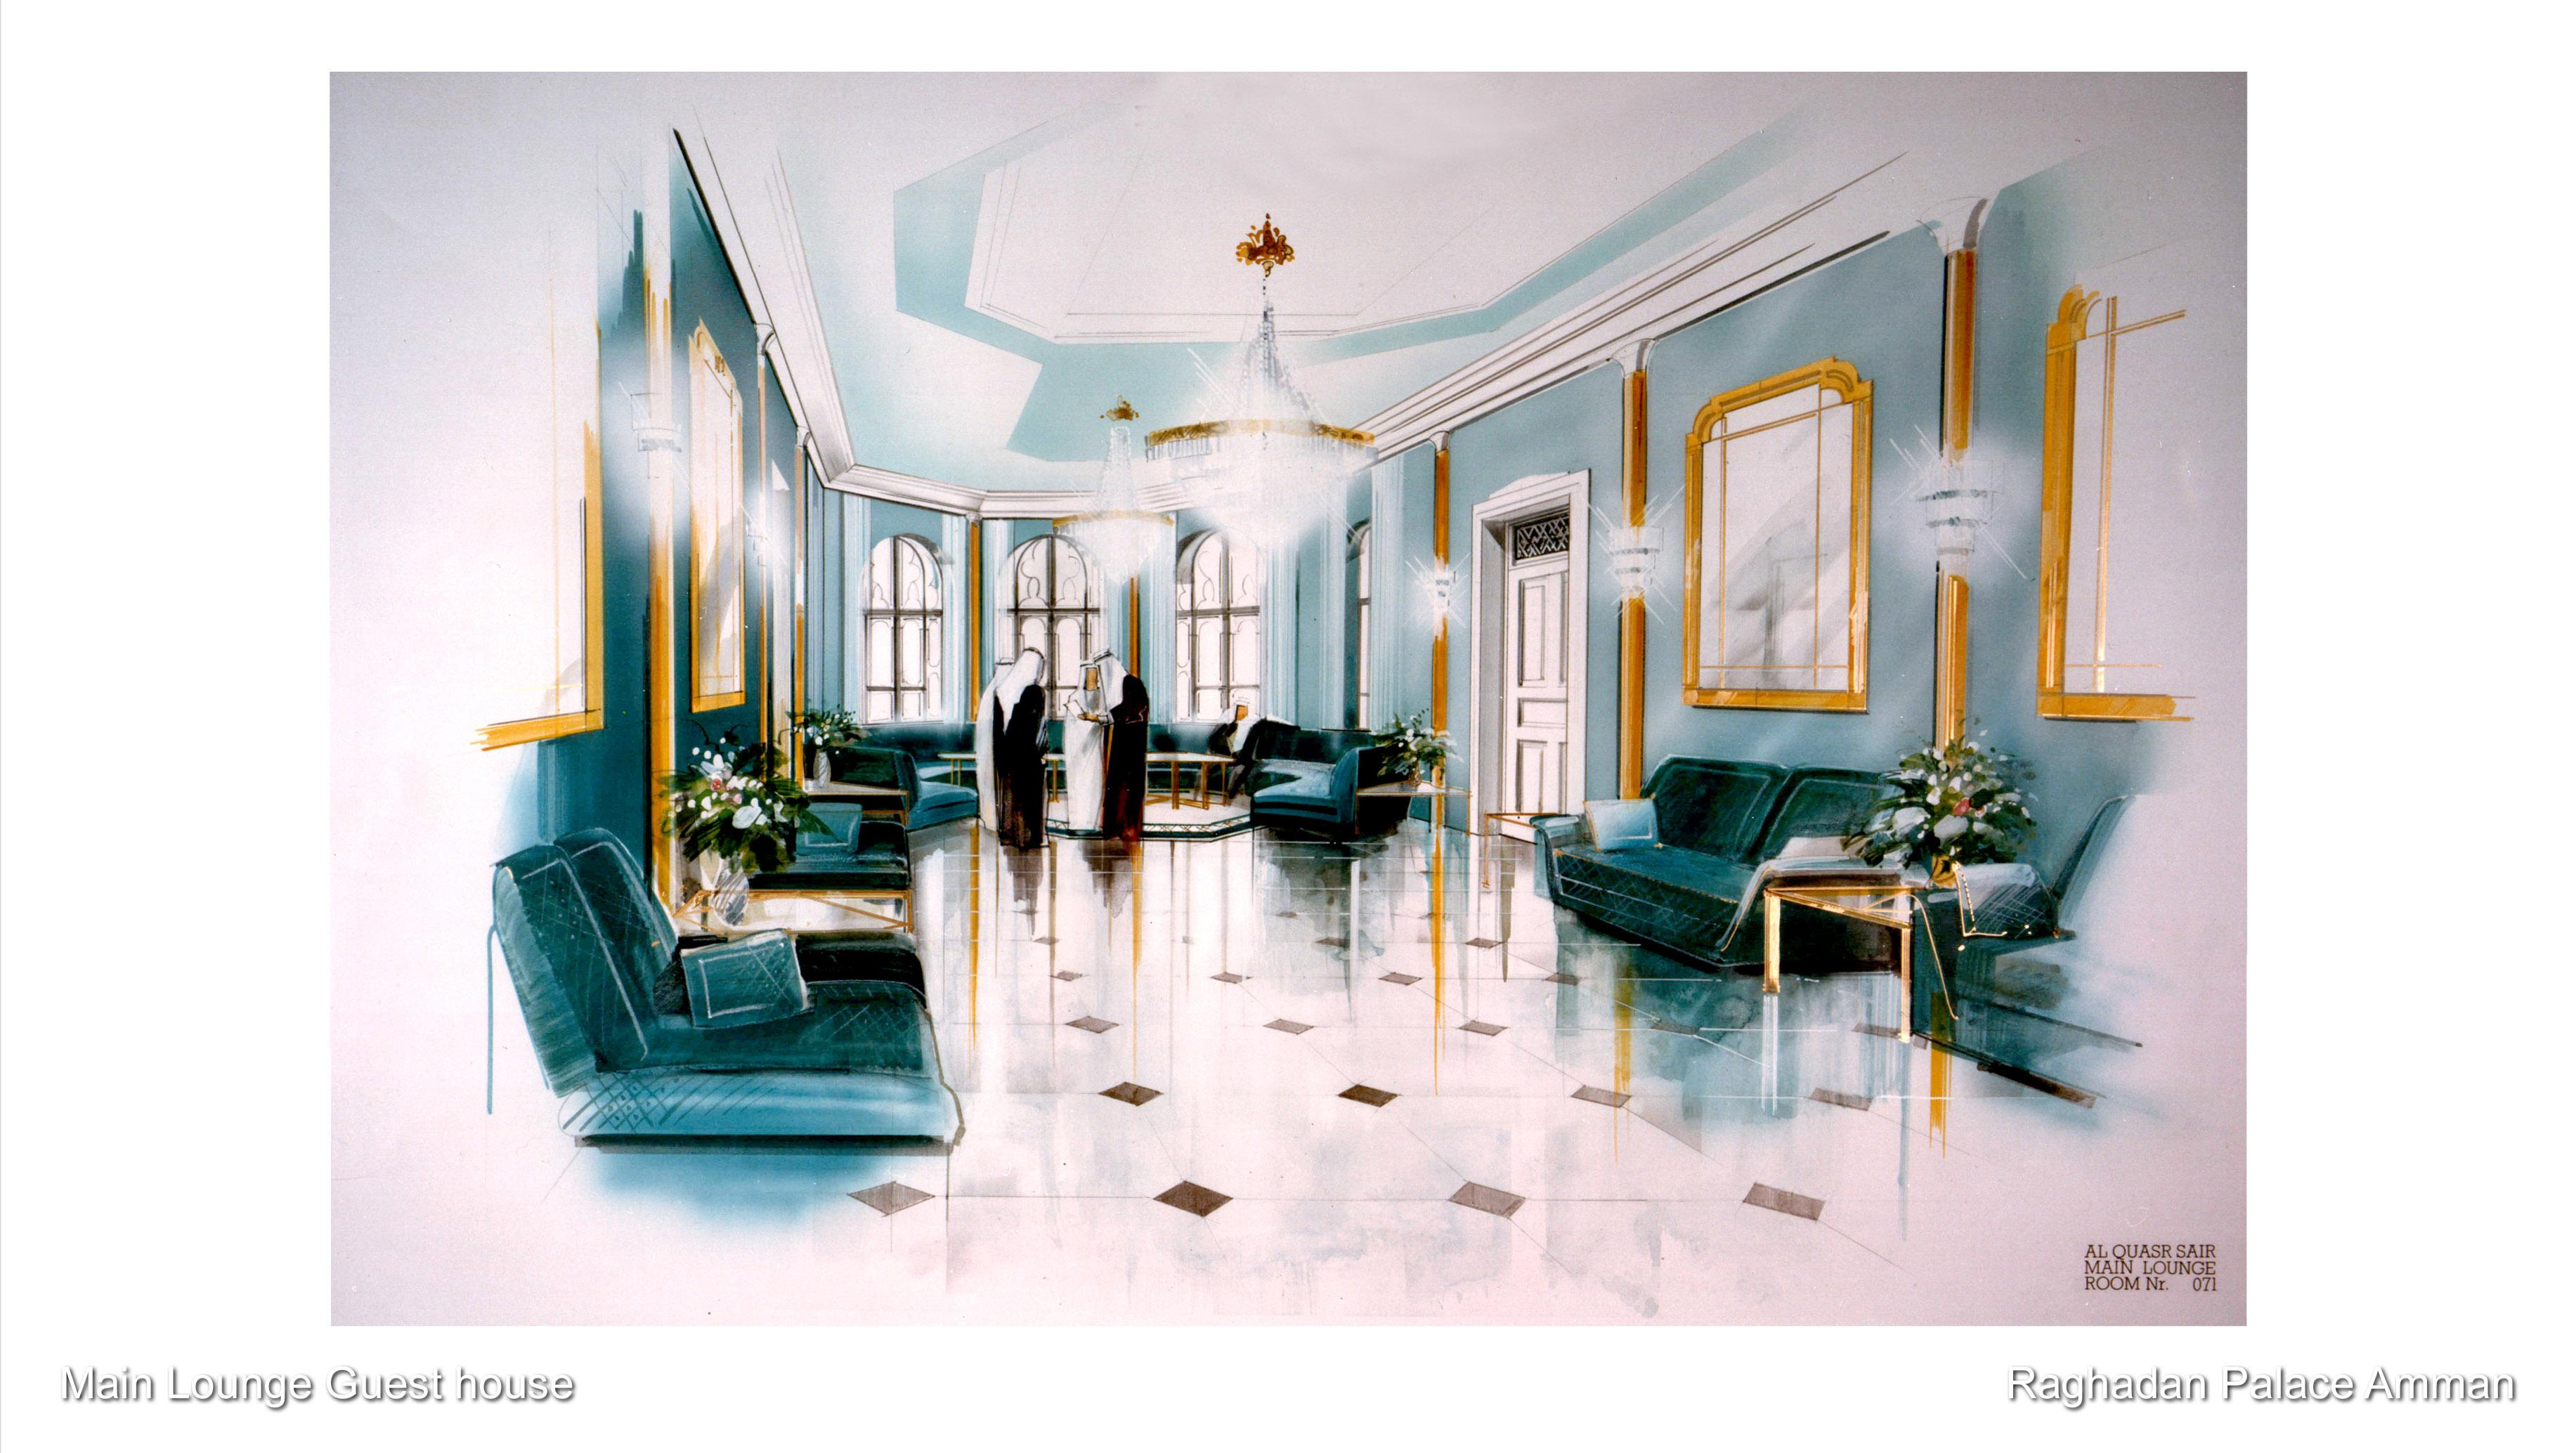 11_RP Amman Lounge Guest house